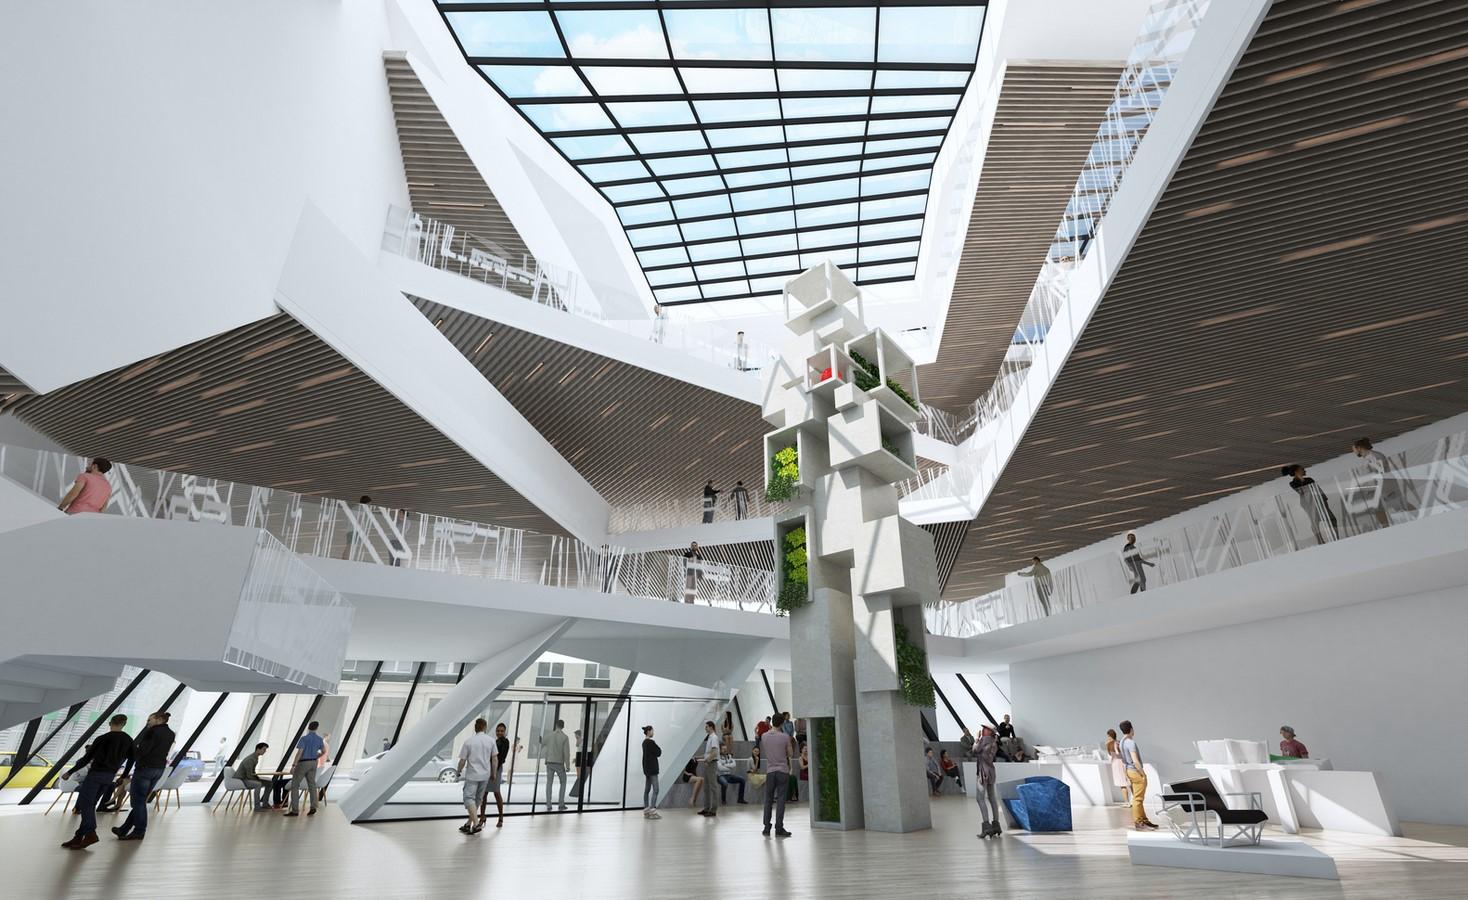 Łódź Architecture Center and Nexus21 revealed by Daniel Libeskind - Sheet3